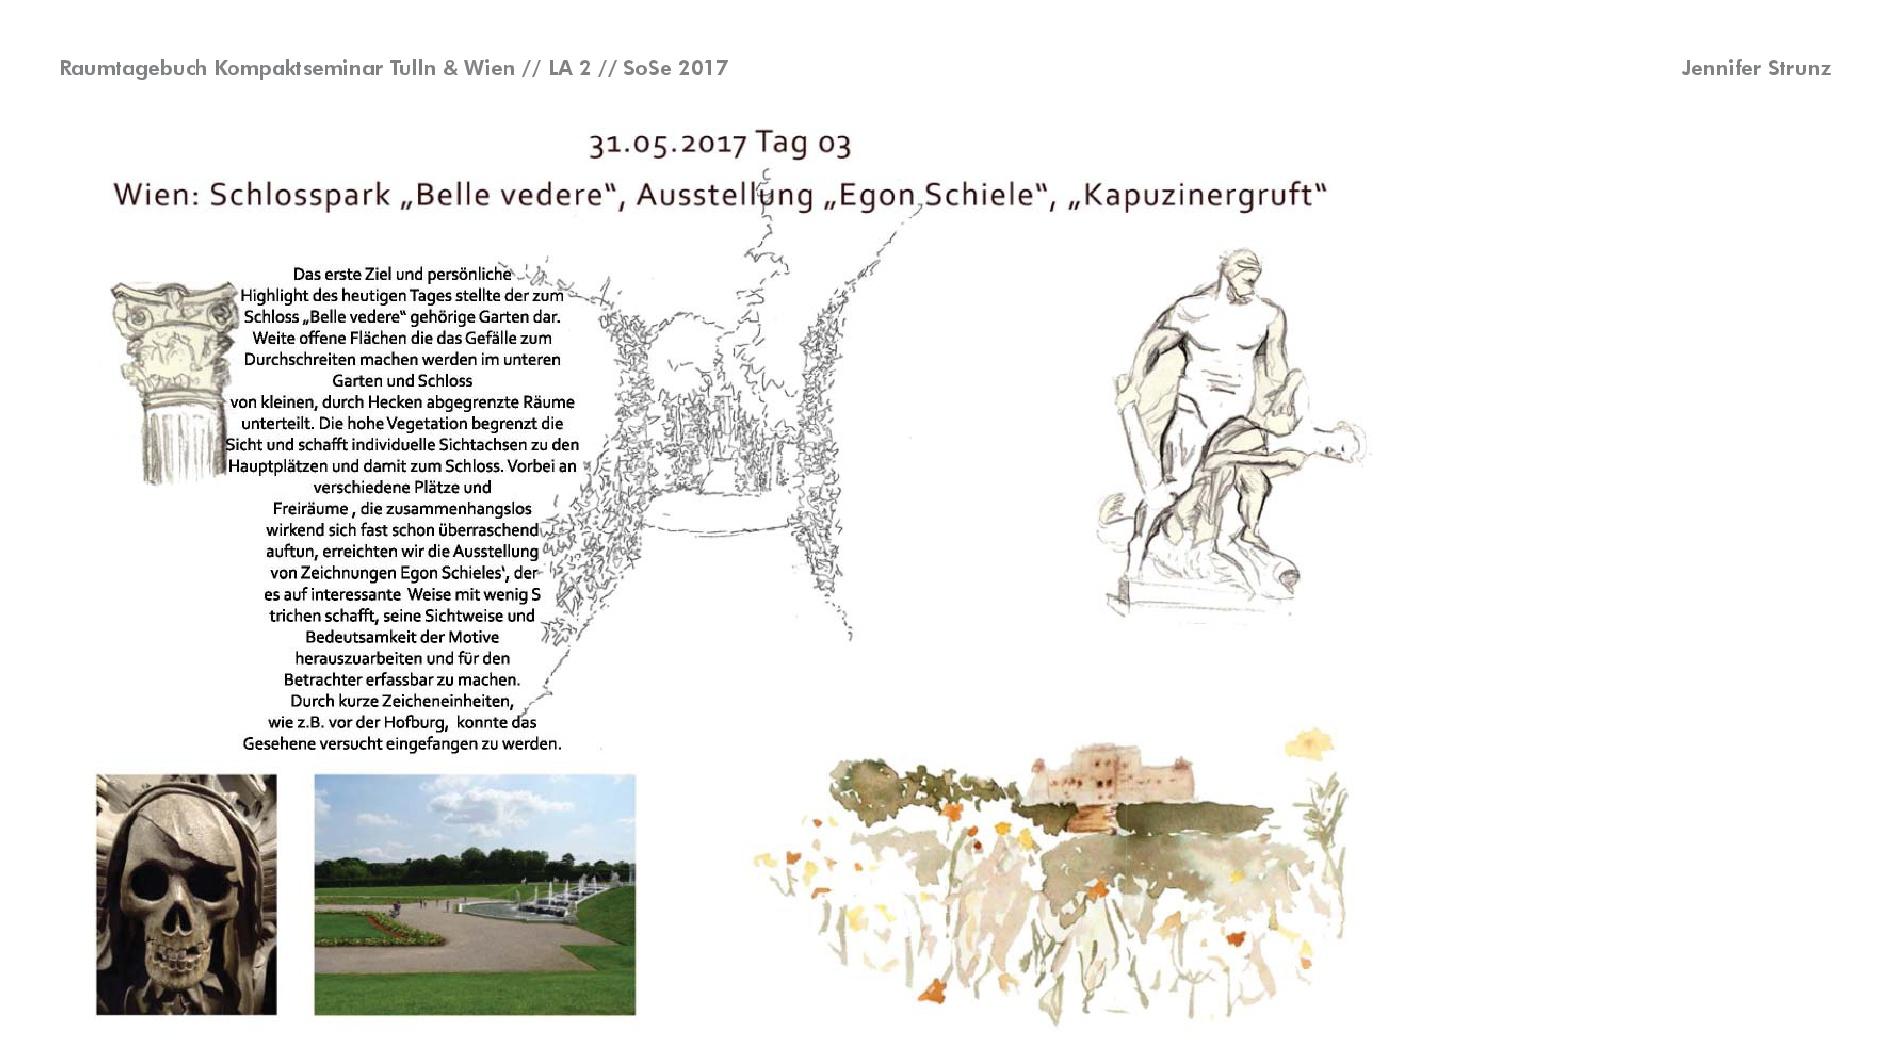 NEU Screen Raumtagebuch Tulln Wien SoSe 17 029